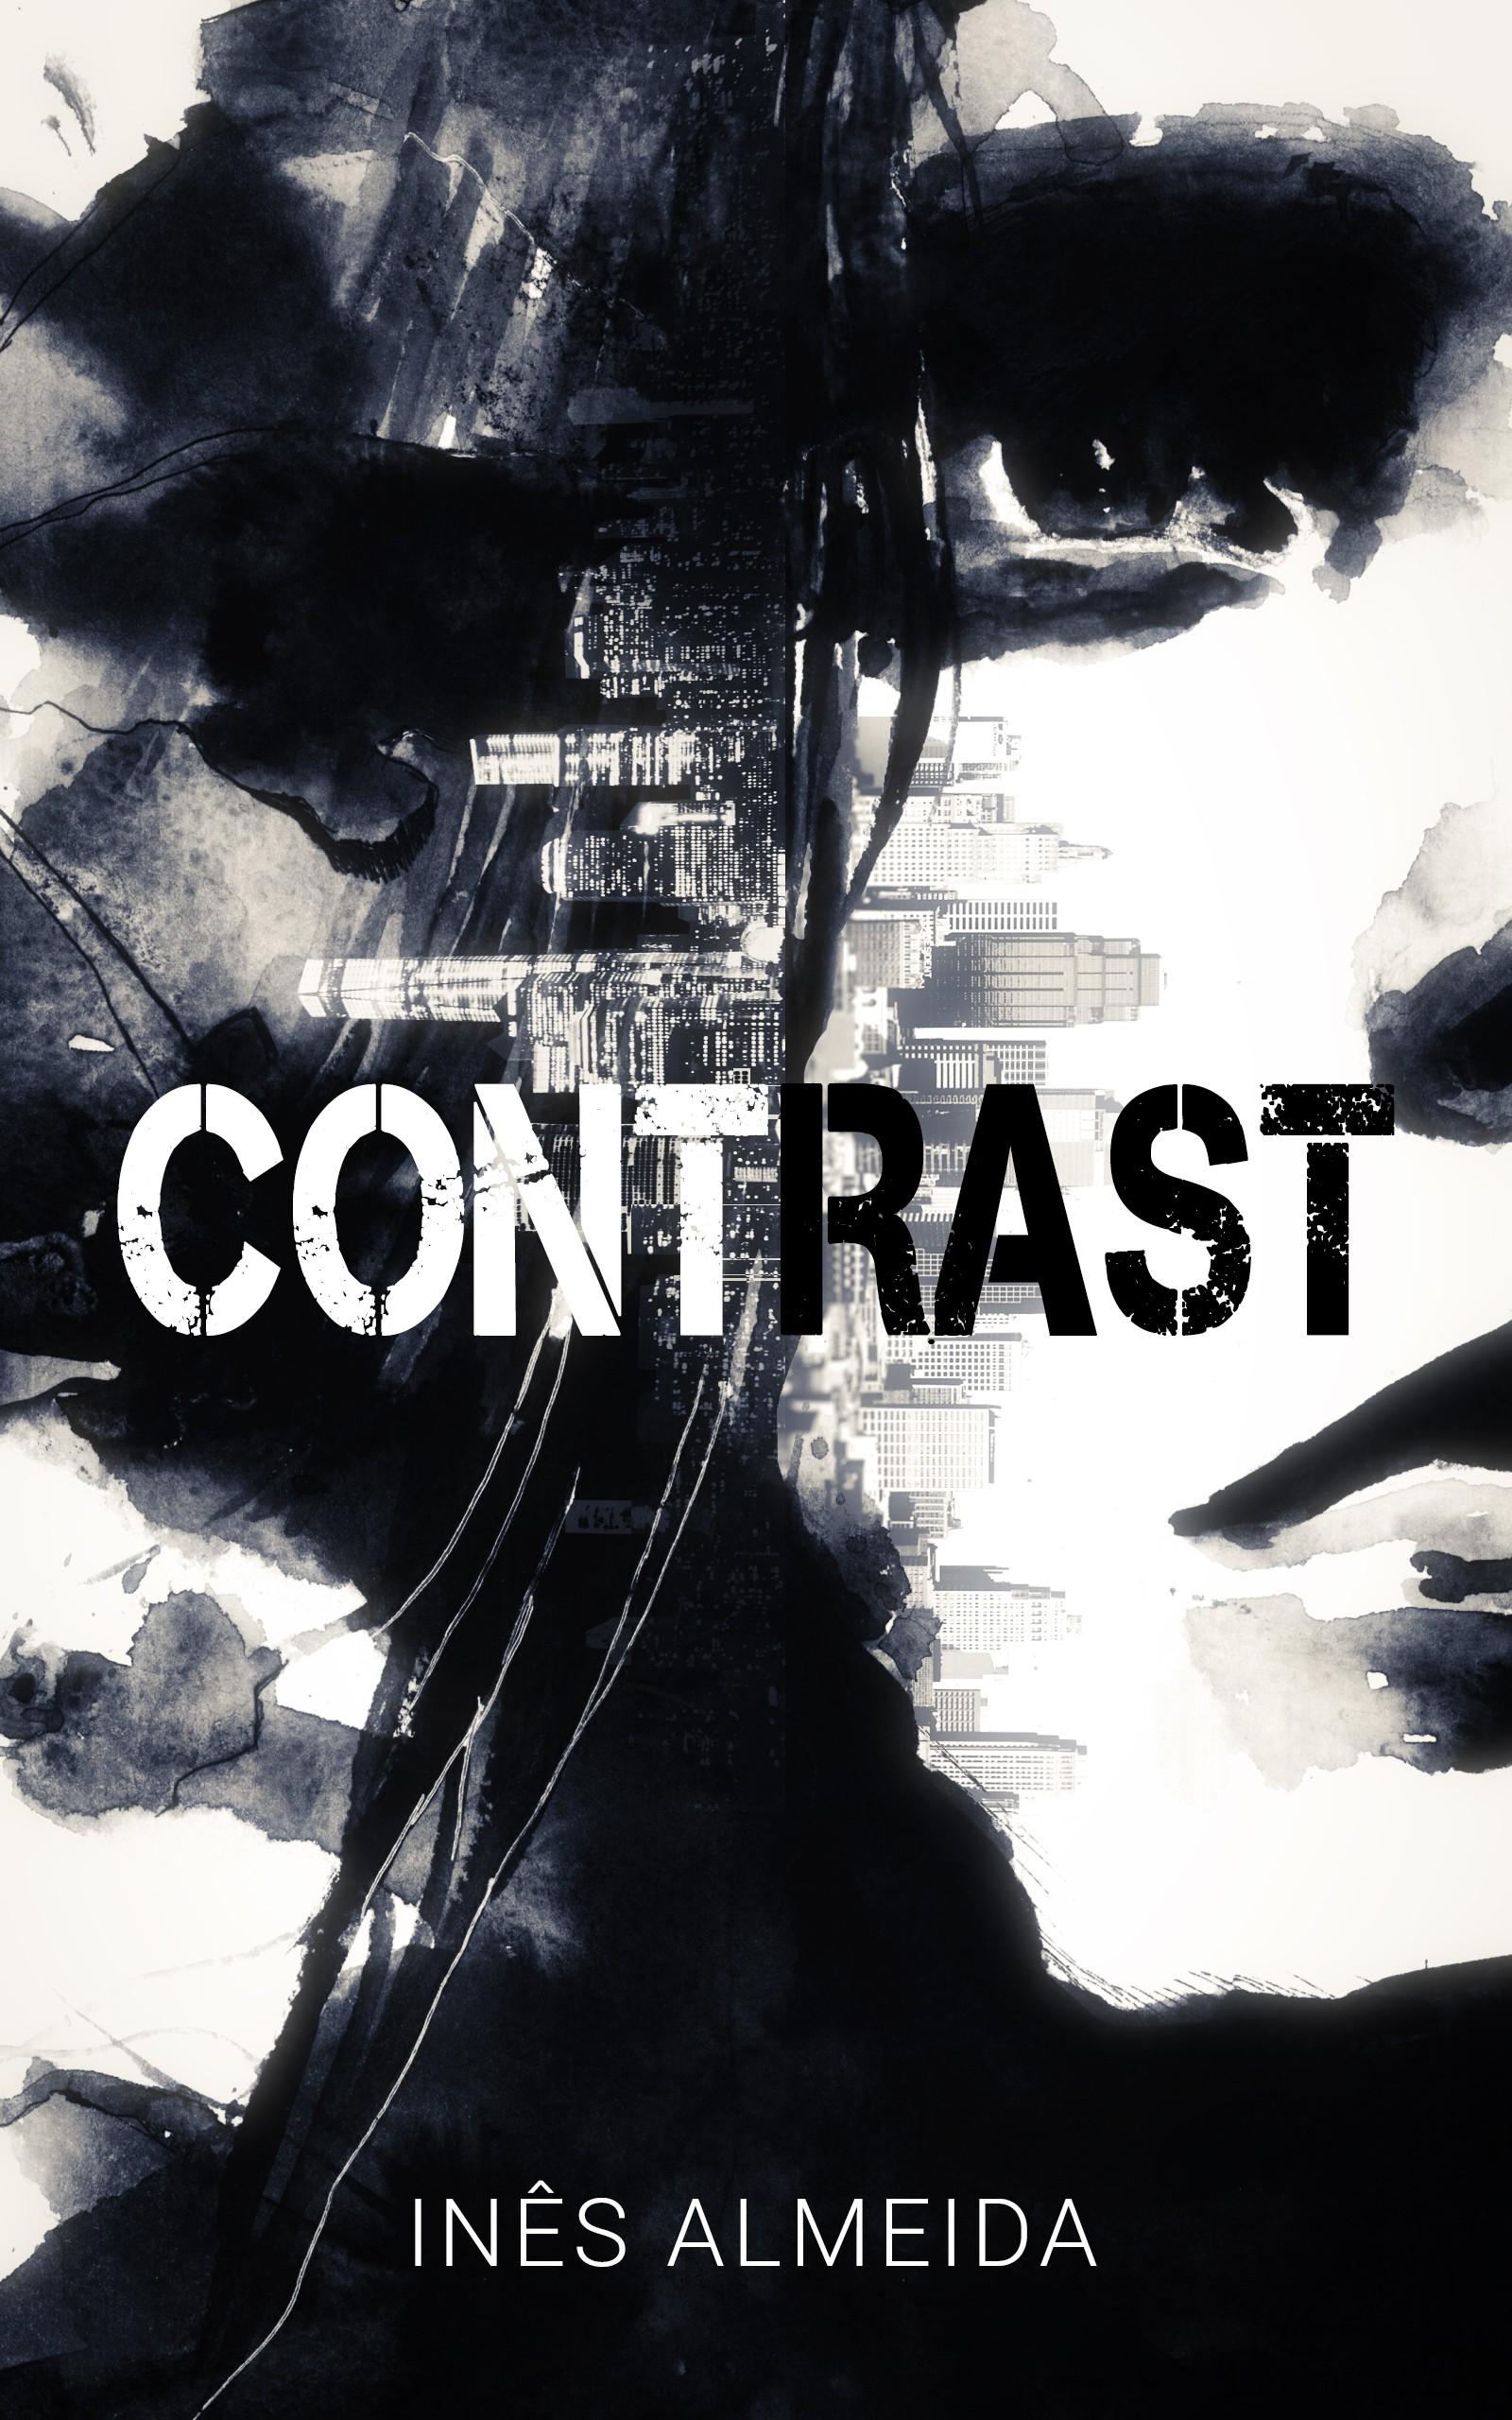 Contrast needs a book cover